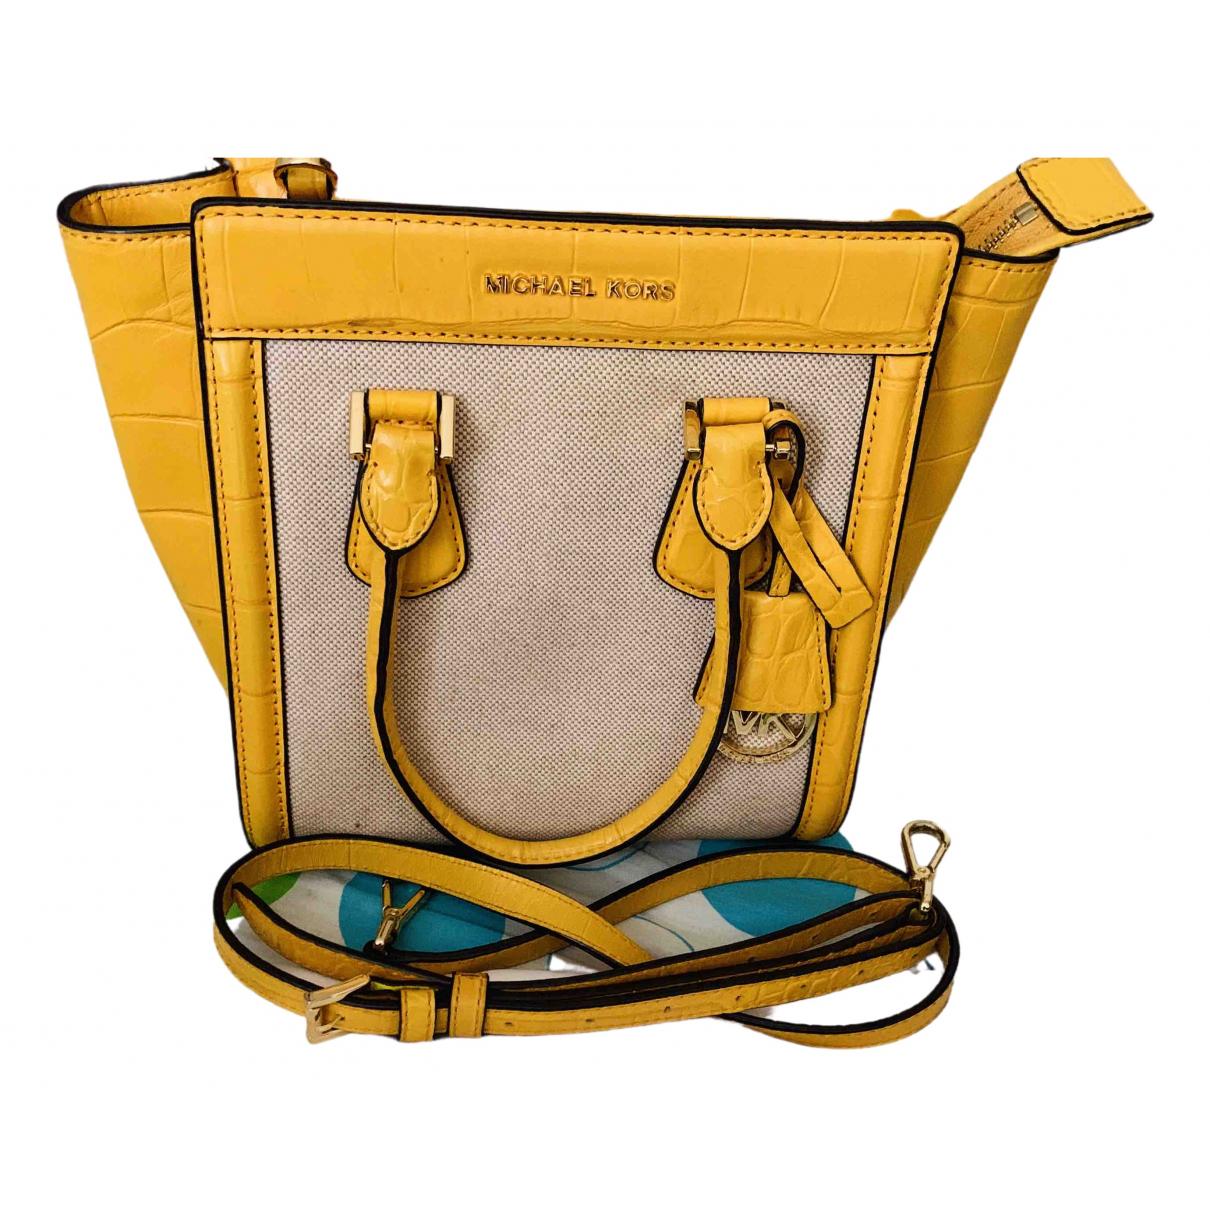 Michael Kors \N Handtasche in  Gelb Leder